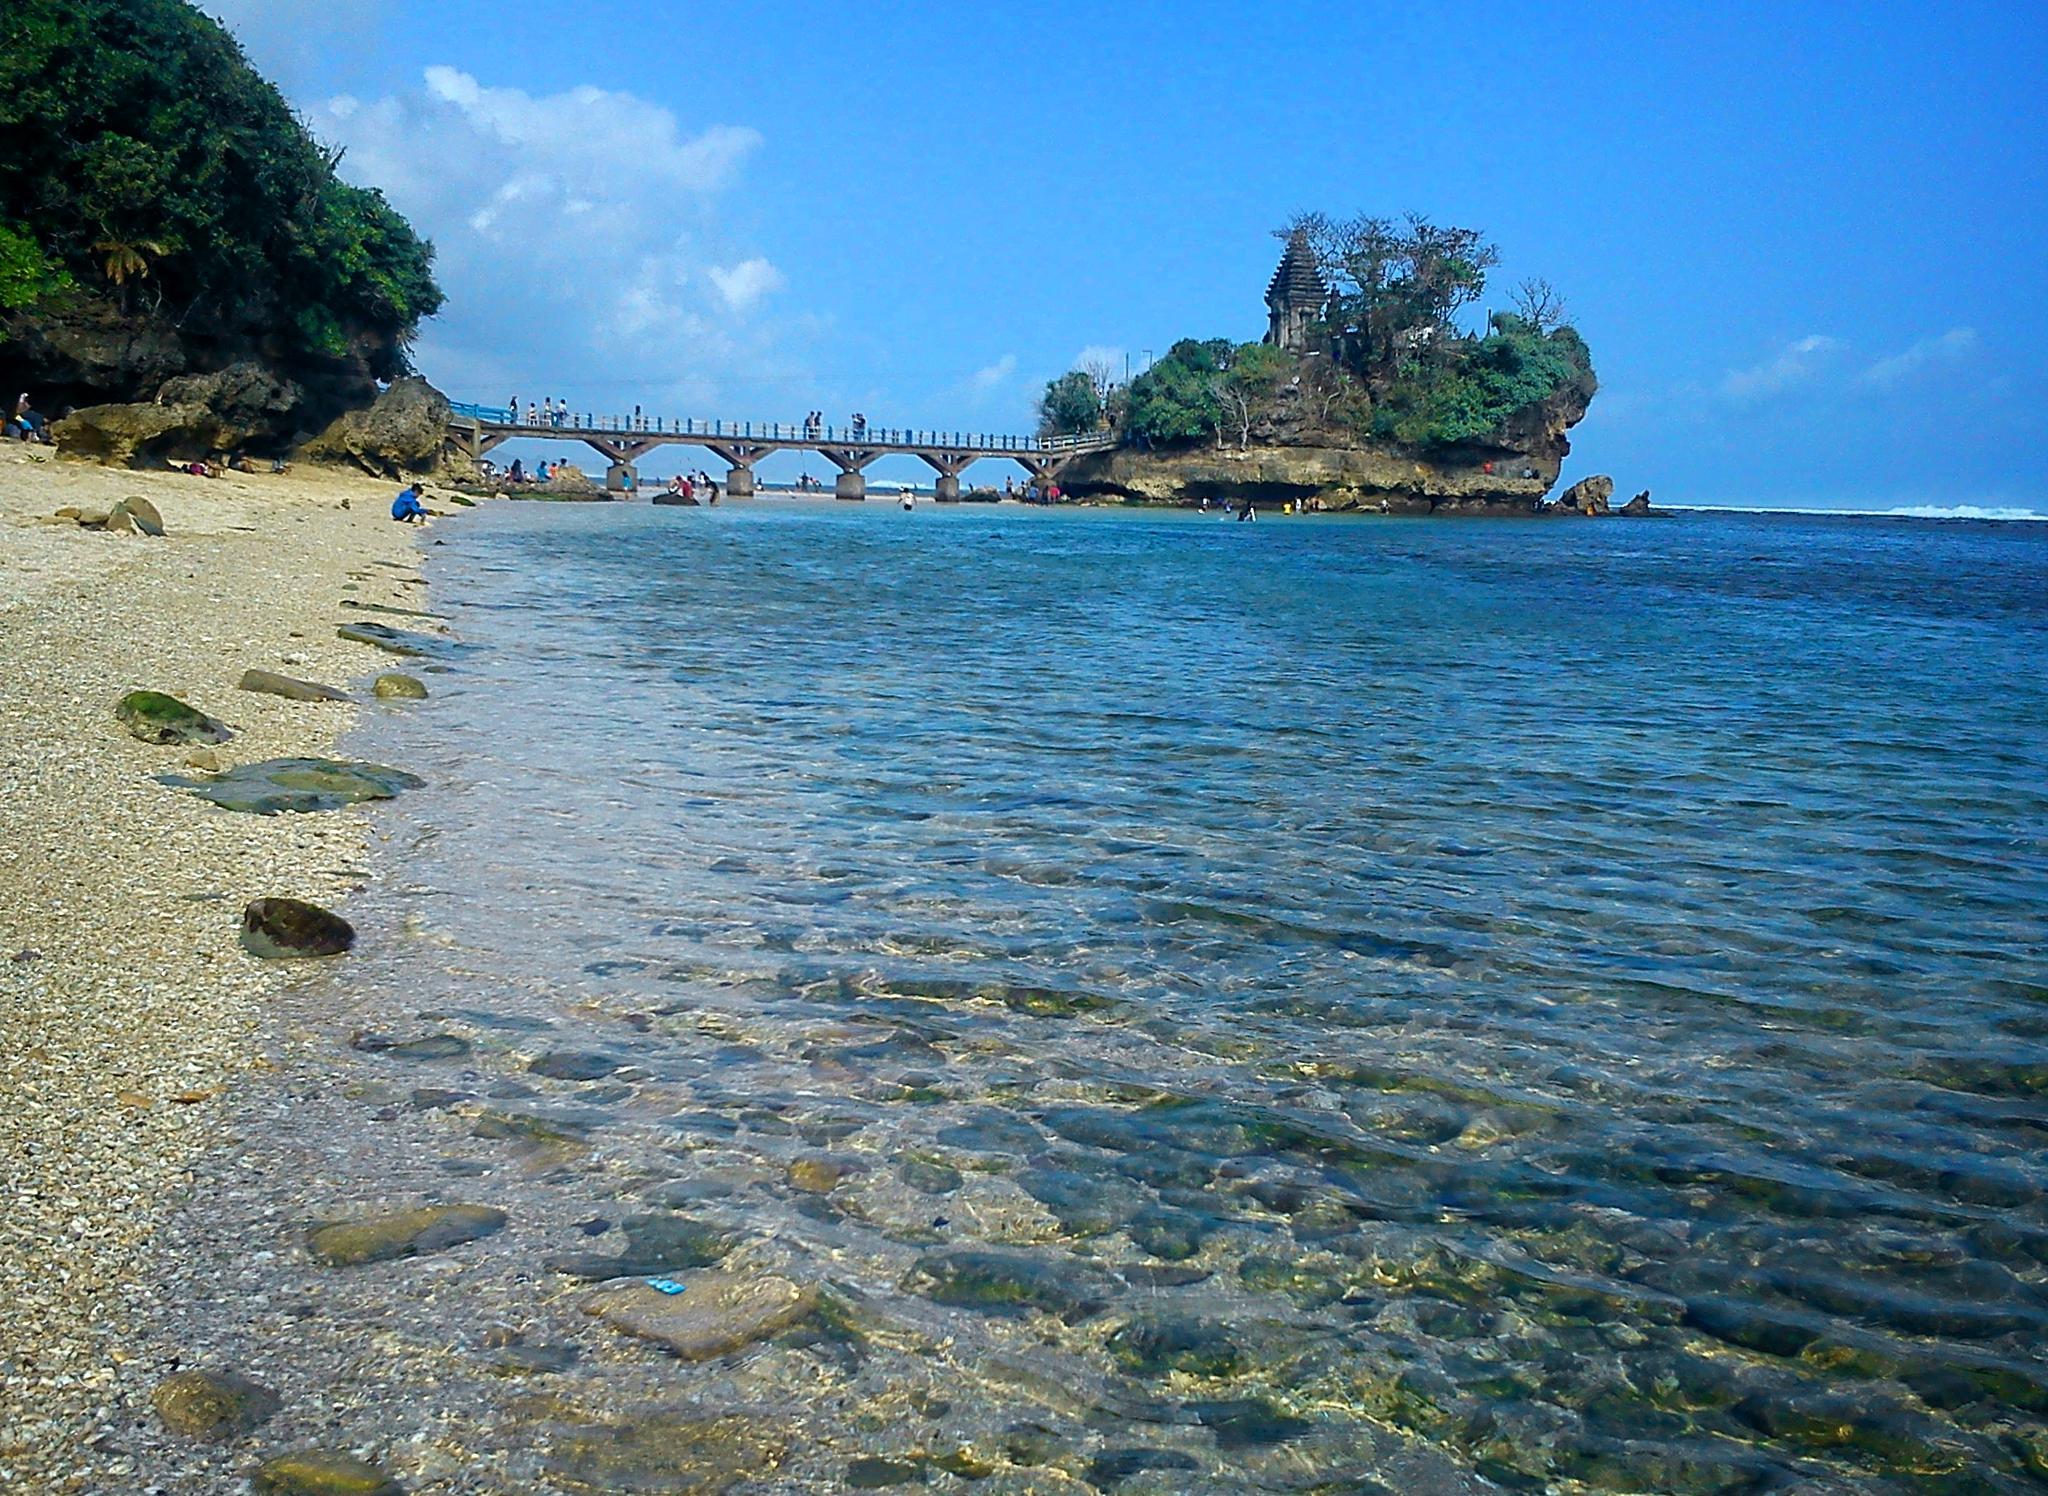 Balekambang Beach, Malang, East Java, Indonesia by ciplukan niz3